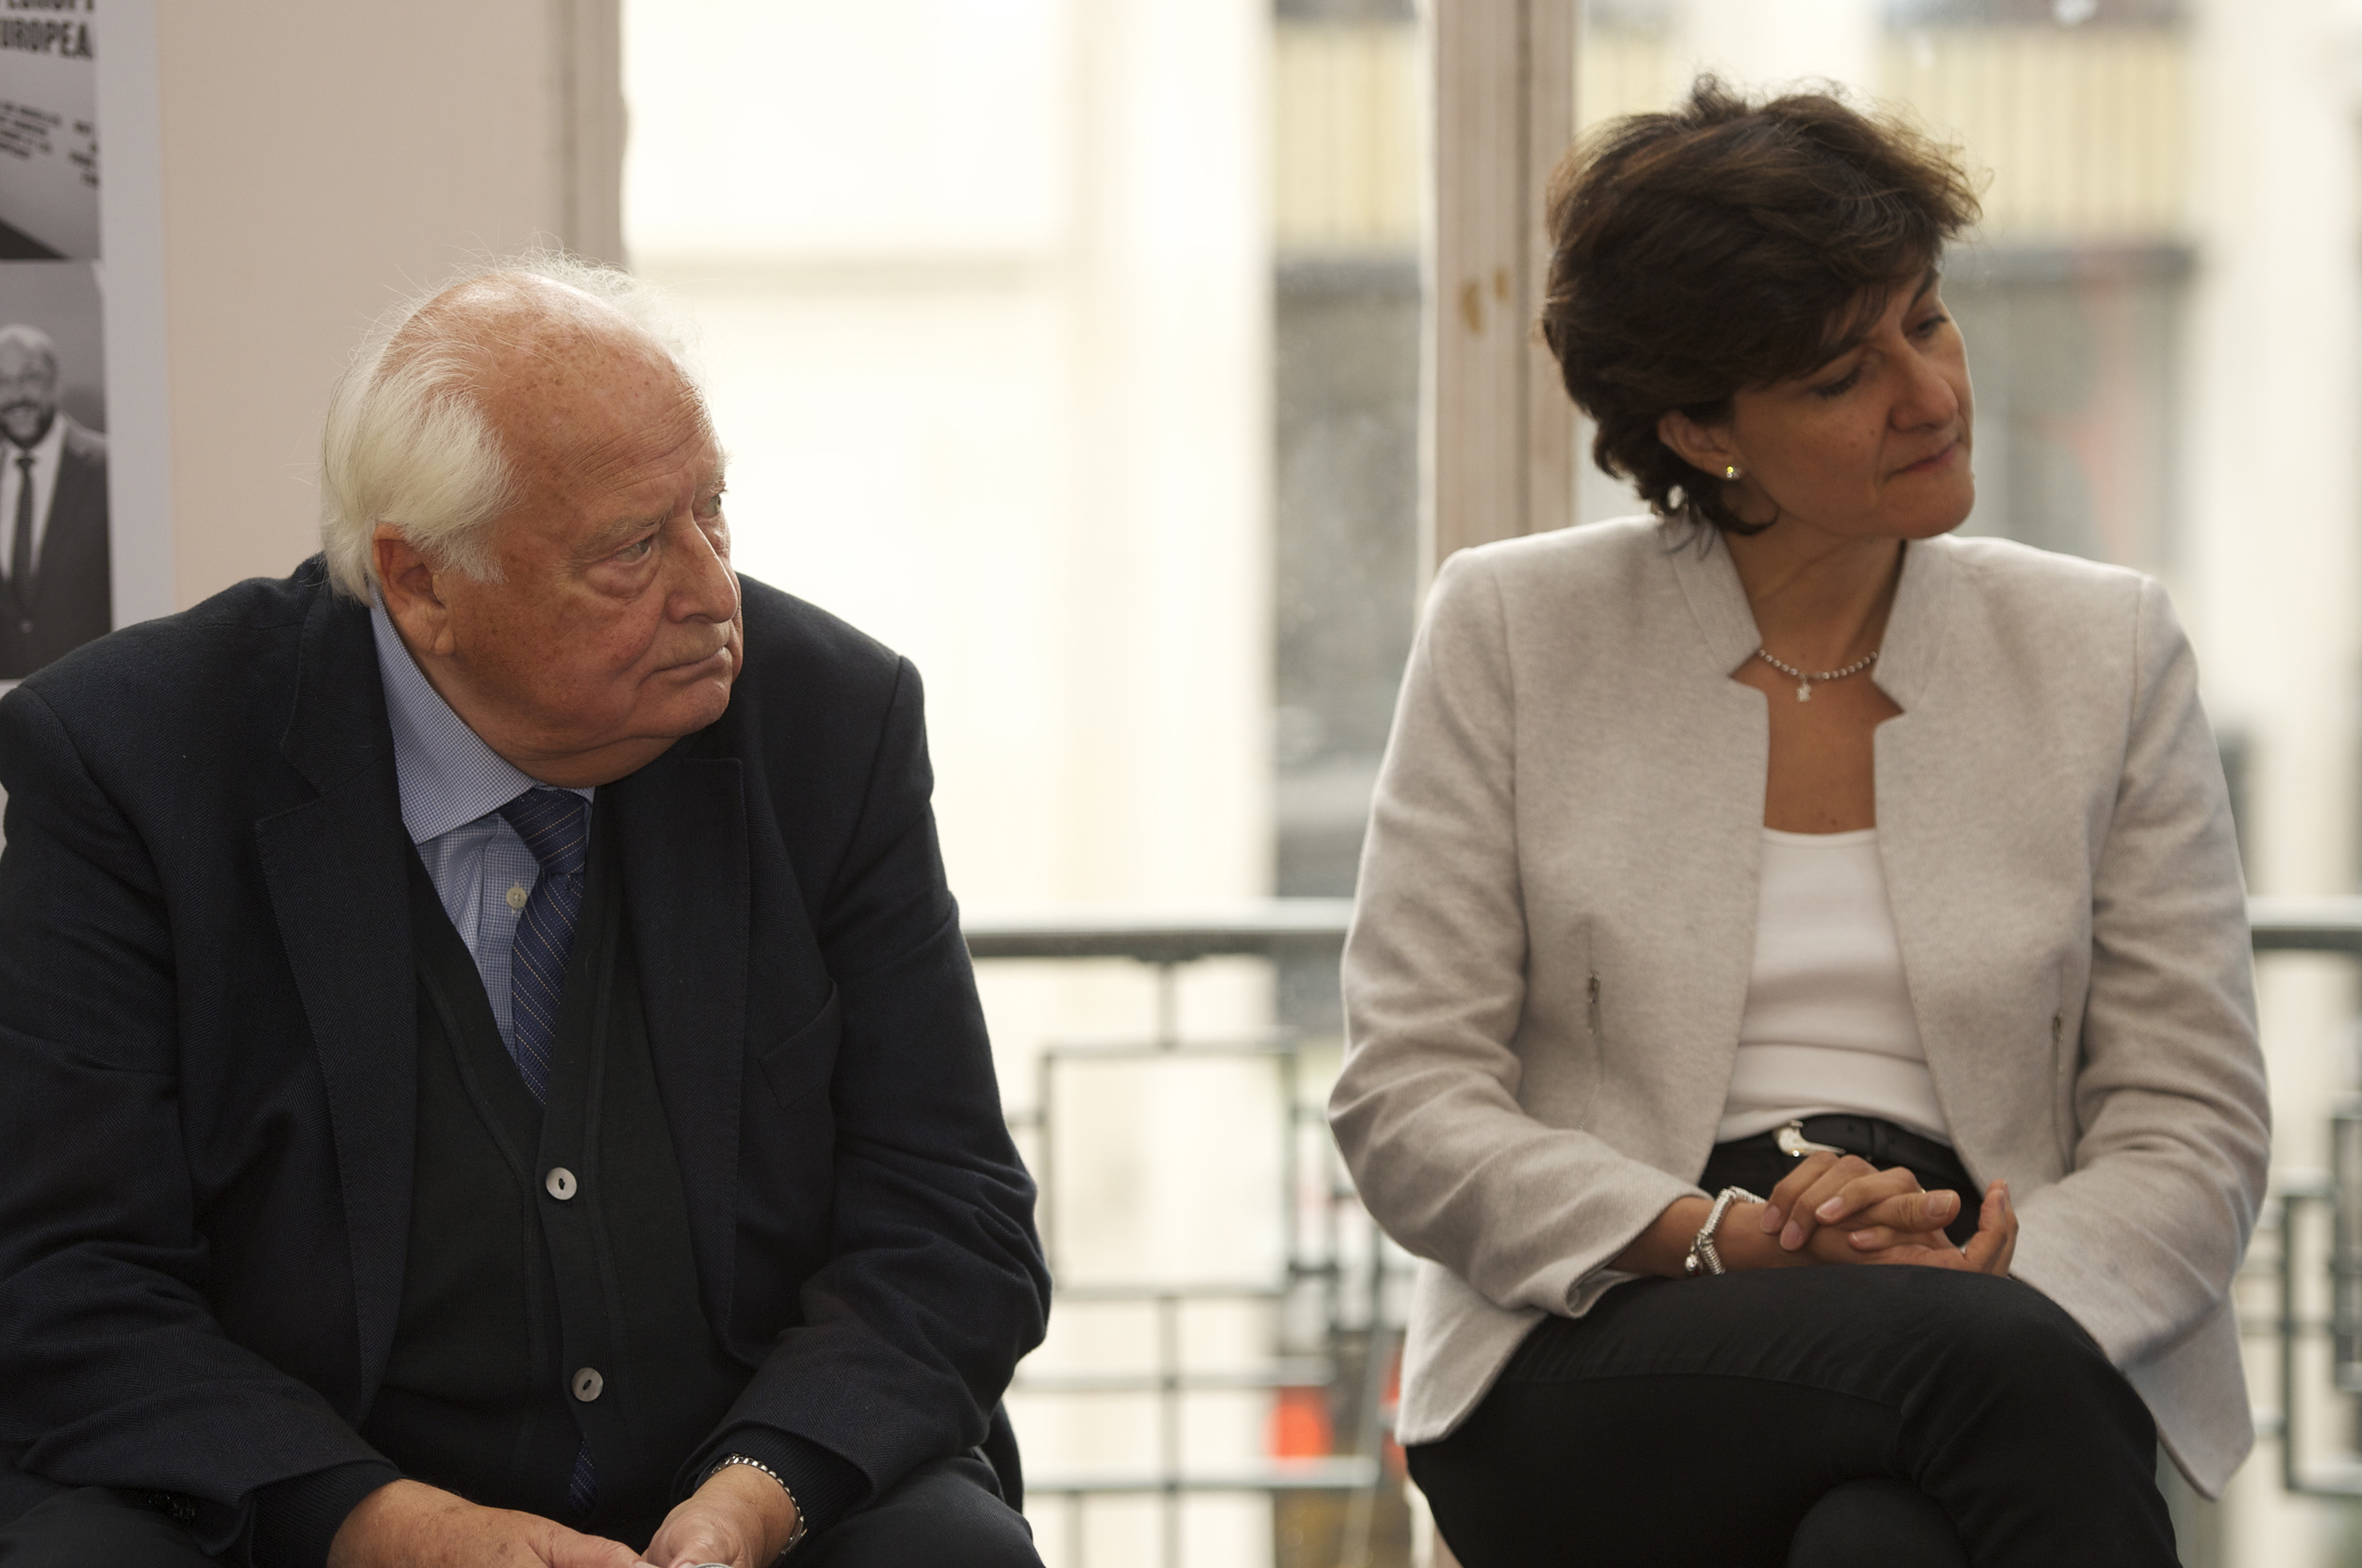 Raymond Georis and Sylvie Goulard at theHistoric Speech debate at BOZAR.Photo ©Yves Gervais